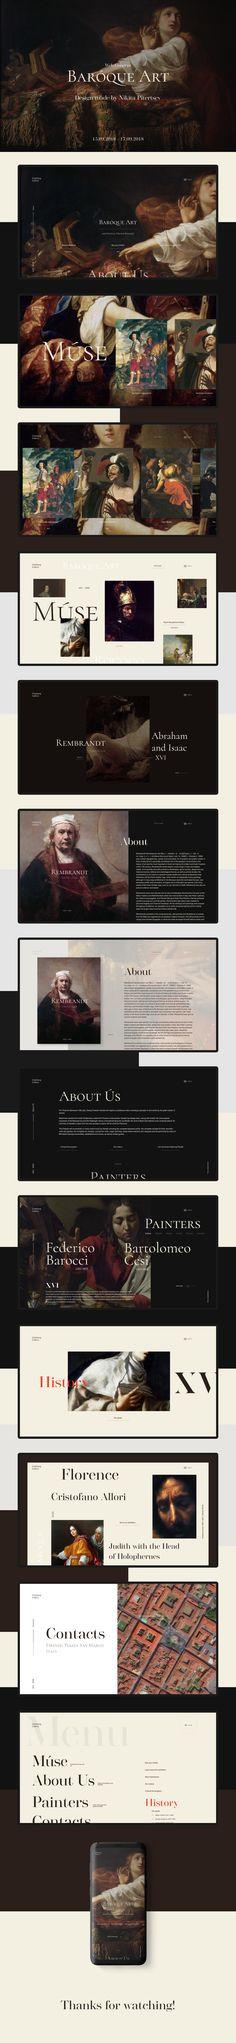 Göteborg Gallery (Baroque Art) on Behance Web Layout, Layout Design, Website Layout, Art Web, Baroque Art, Ui Ux Design, Graphic Design, Web Design Inspiration, Design Ideas